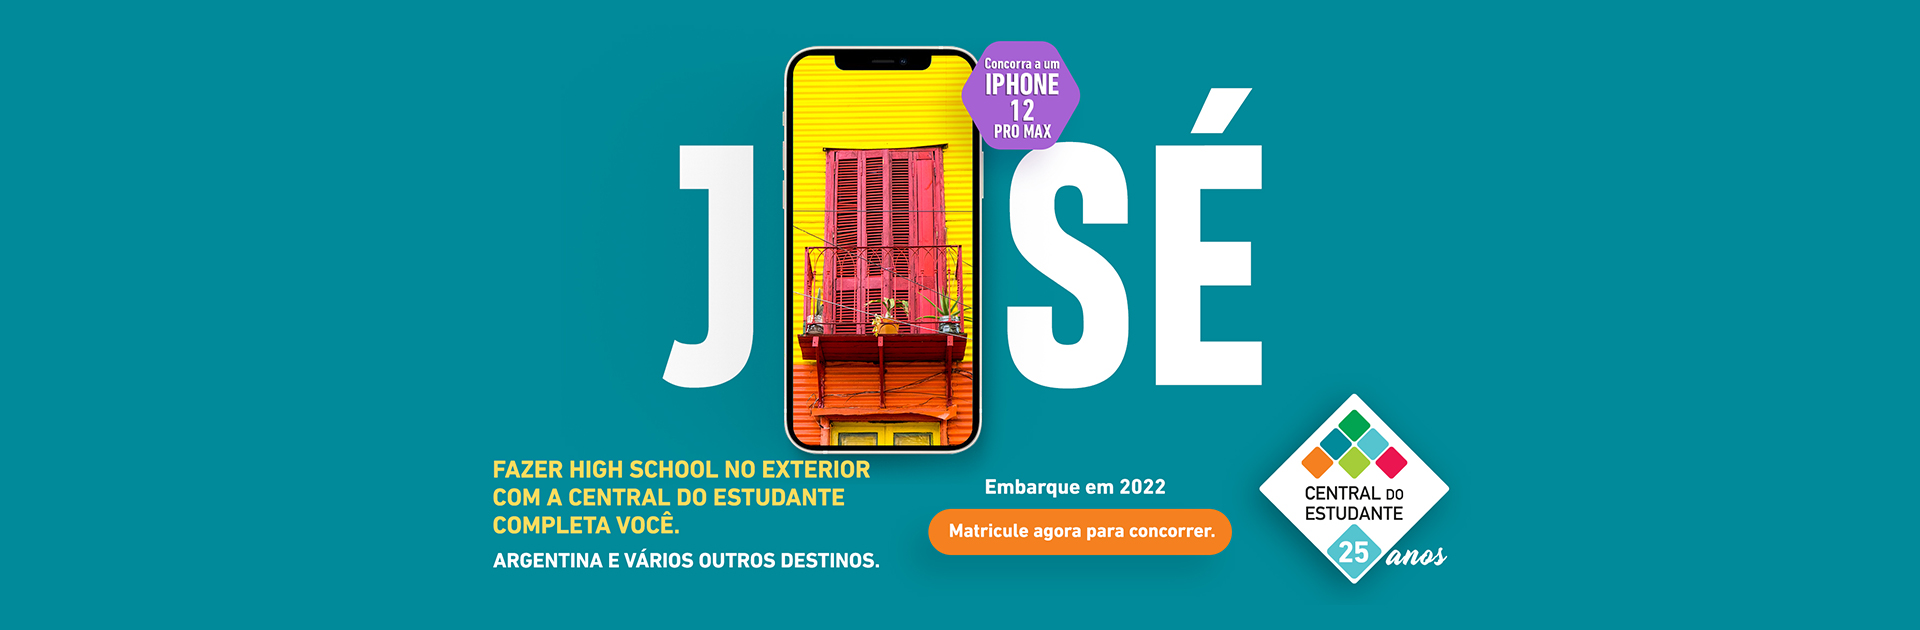 10185_central_estudantes_campanha2022_Alunos_jose